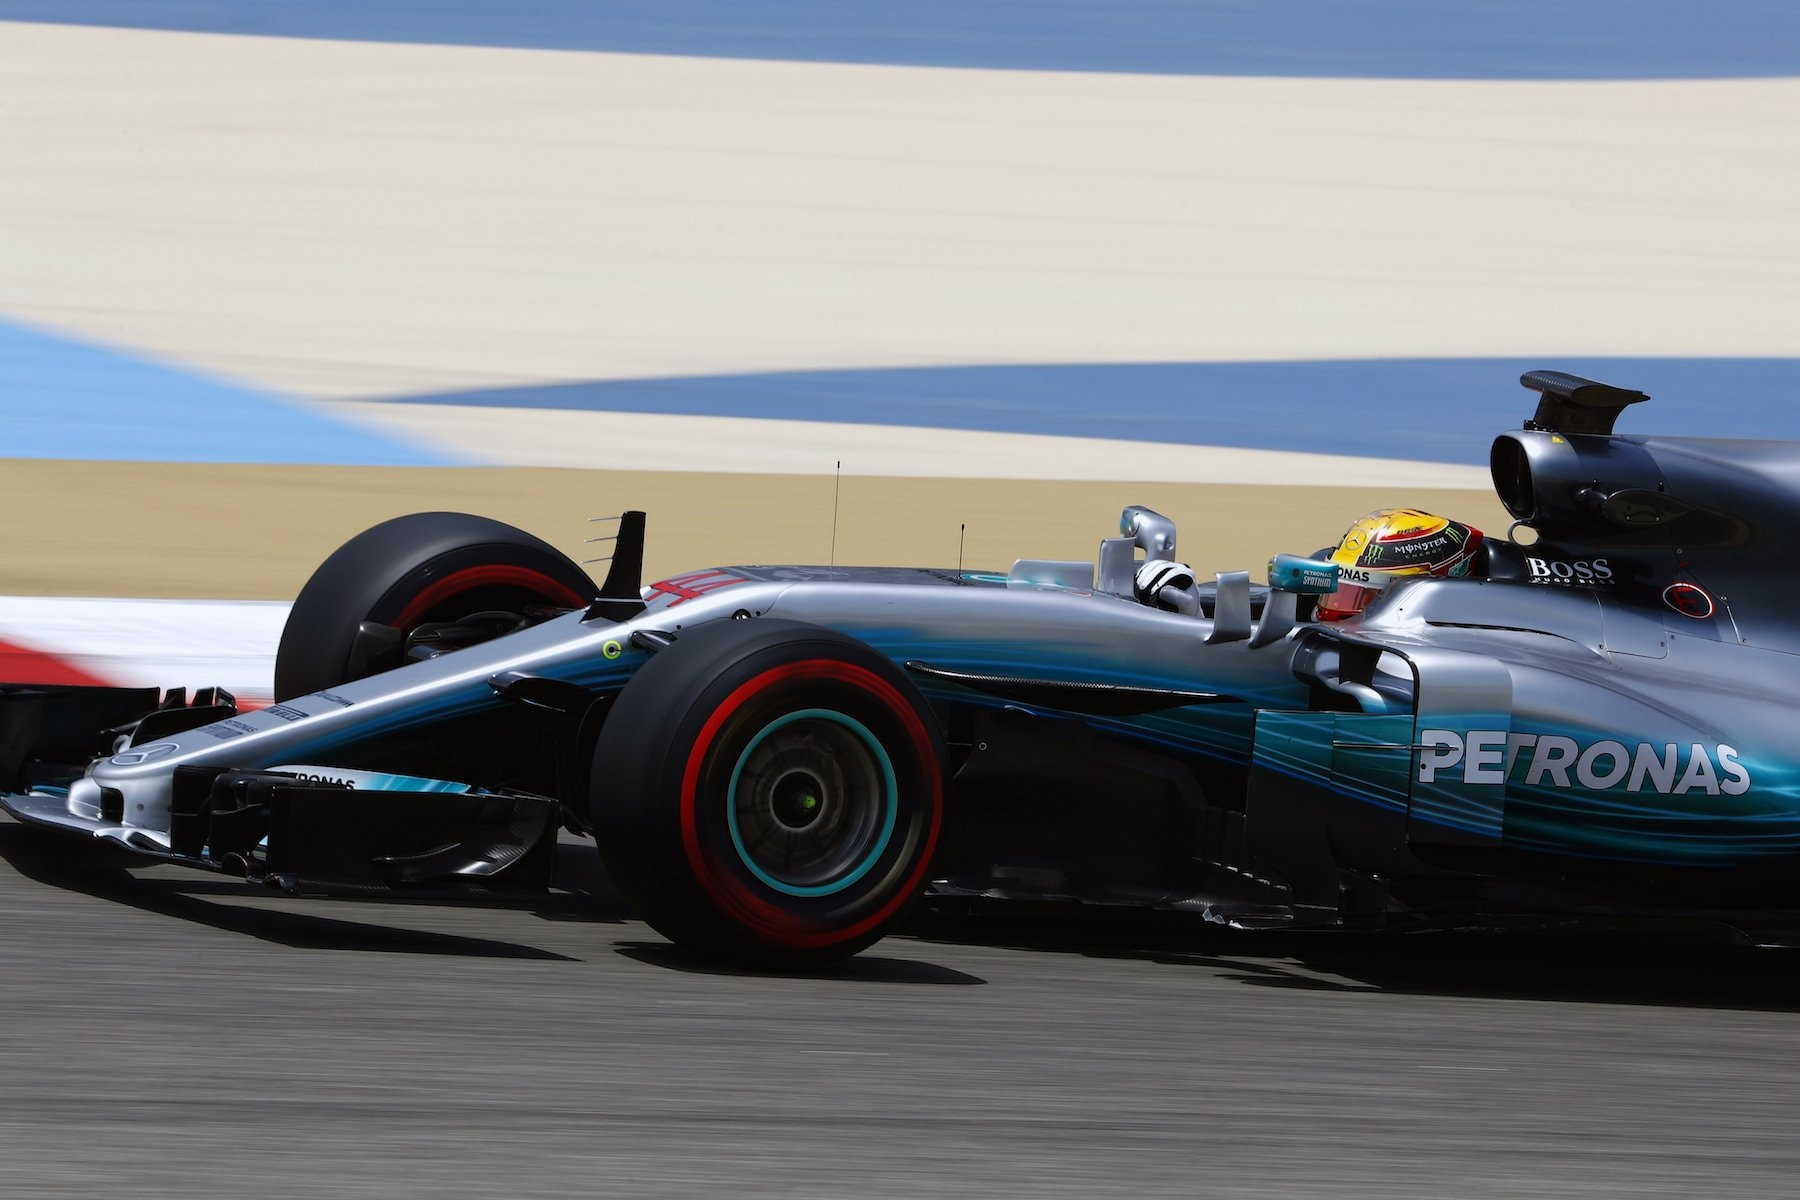 2017 Lewis Hamilton | Mercedes W08 | 2017 Bahrain test 1 copy.jpg